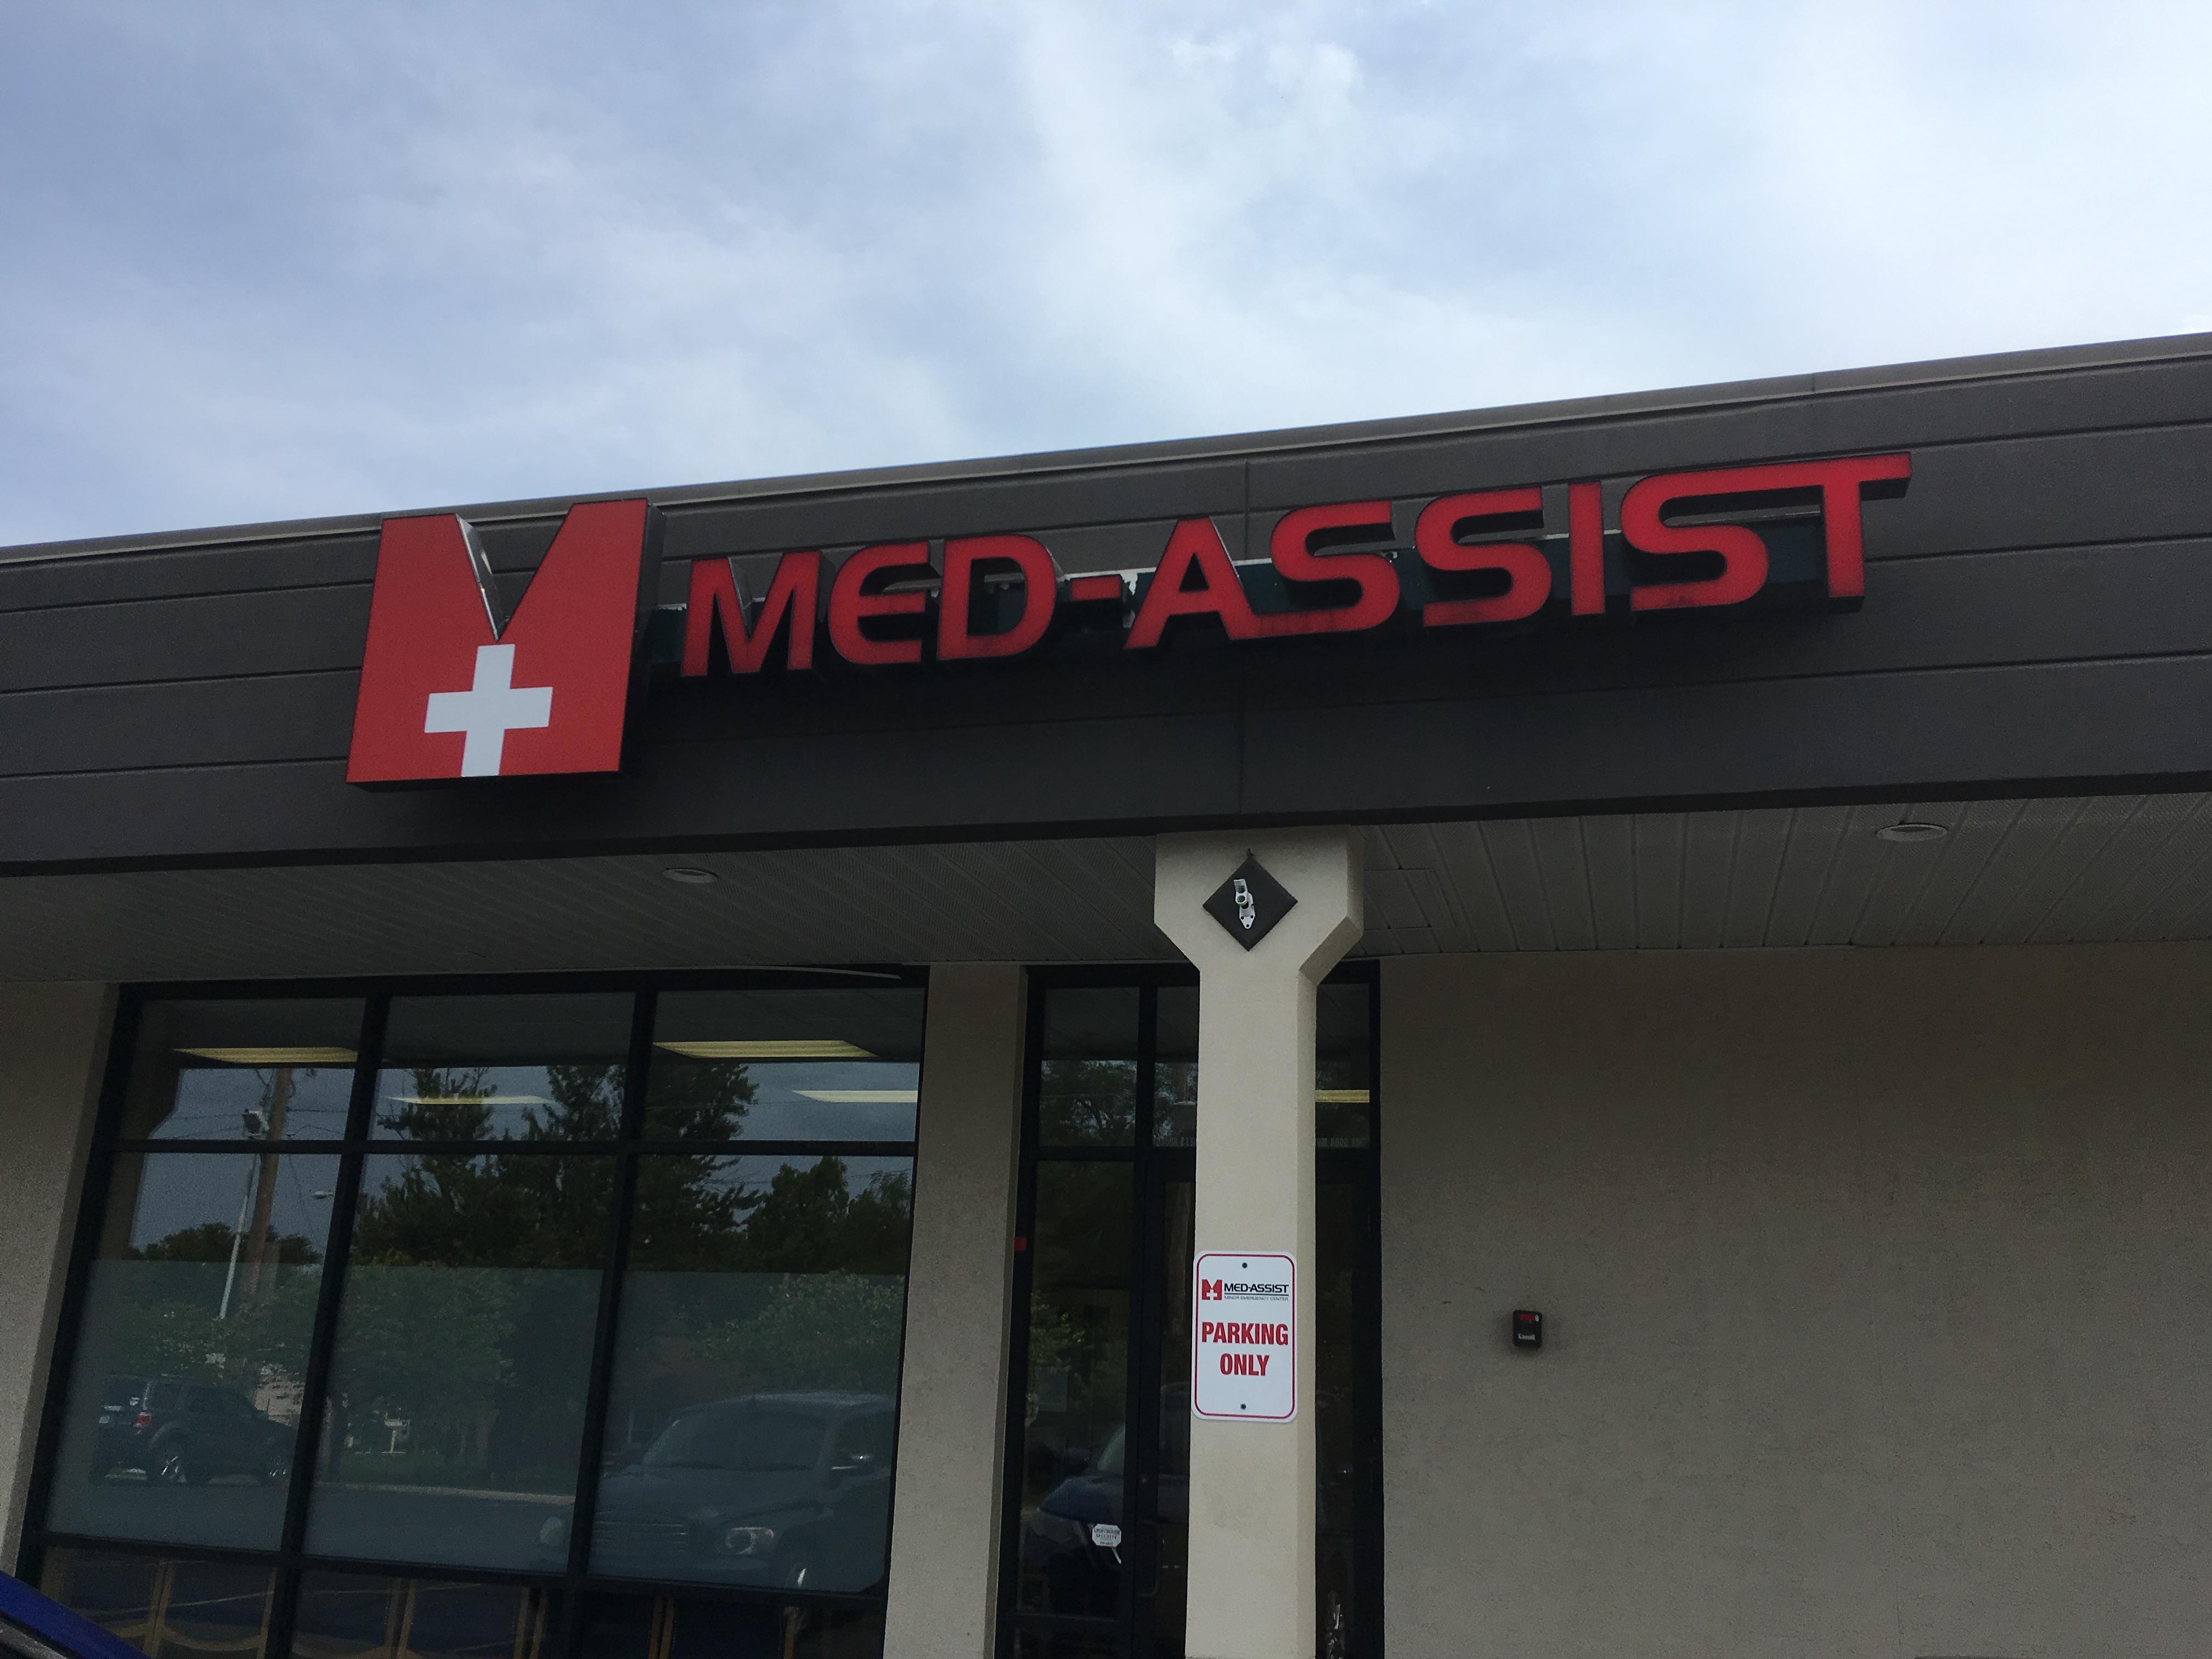 KMC Med Assist image 3